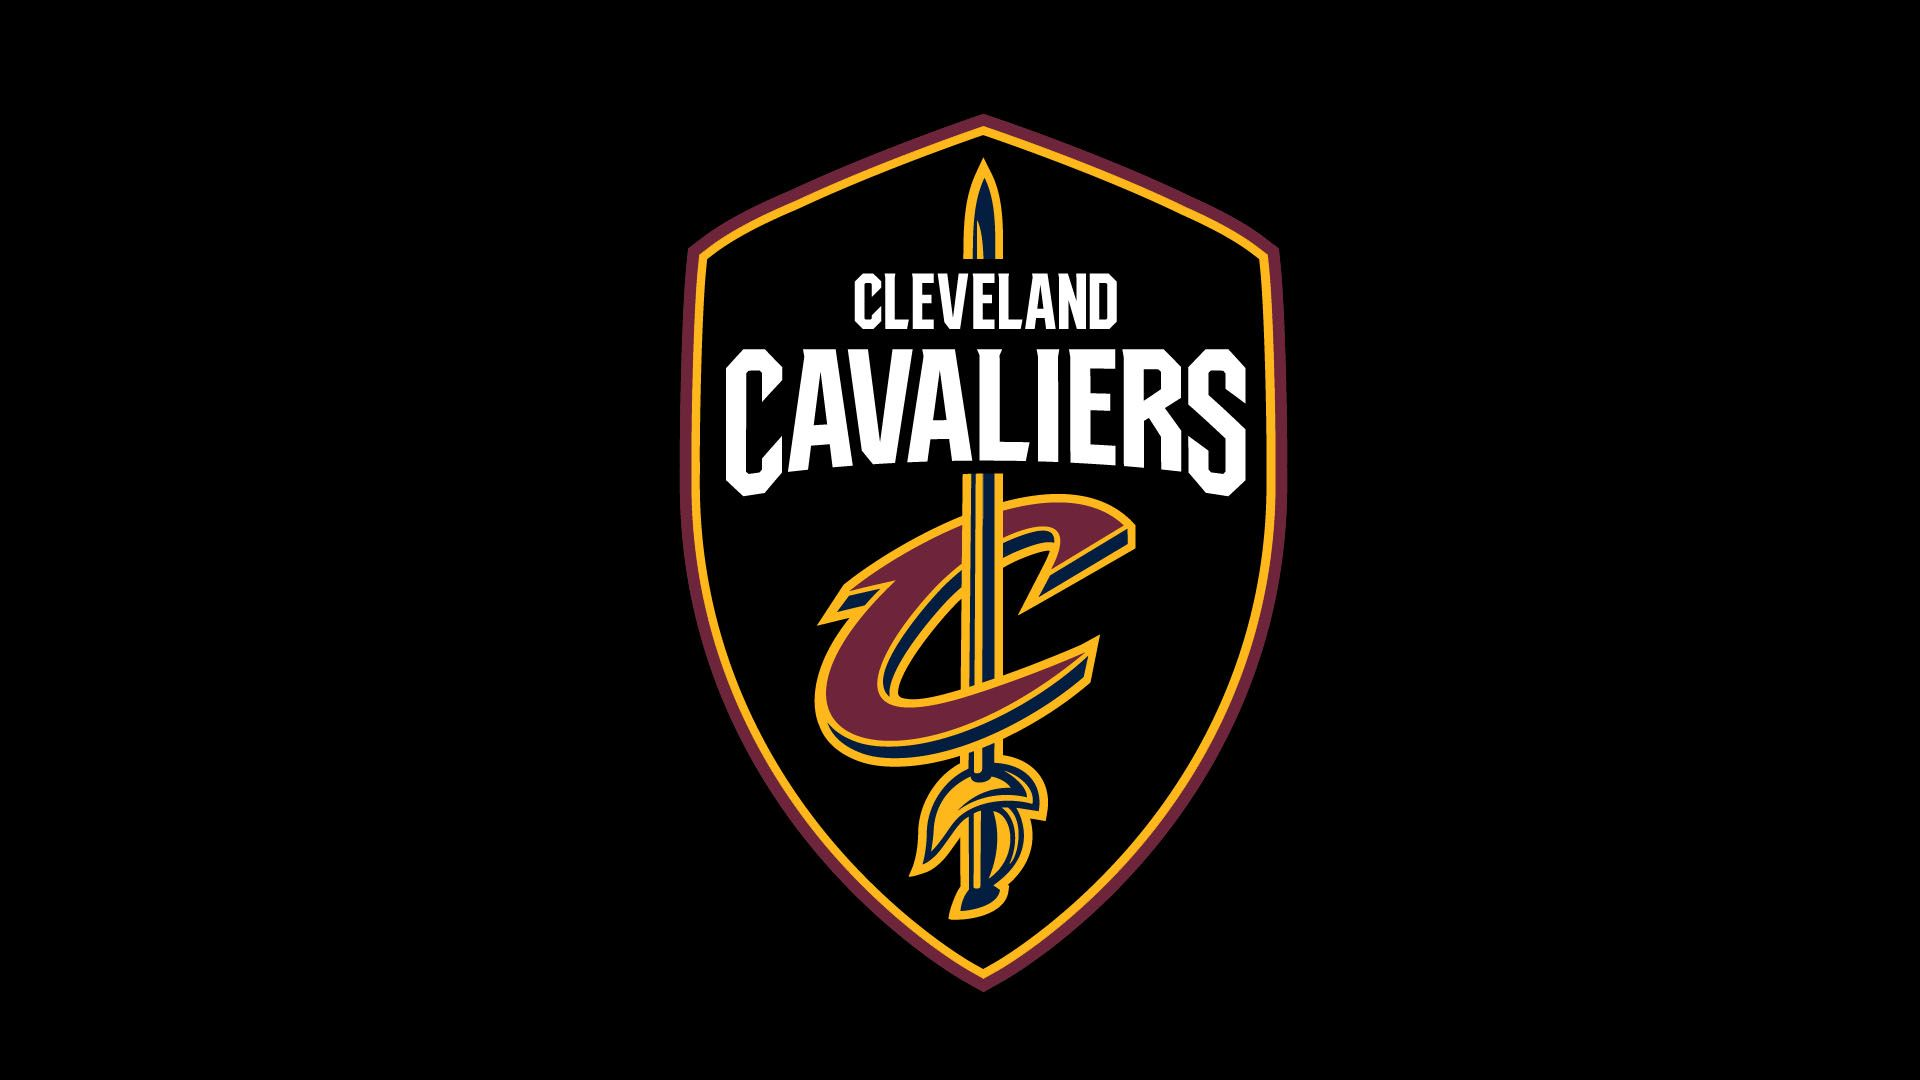 Cleveland Cavaliers Logo Wallpaper 2021 Basketball Wallpaper Cavs Logo Logo Logos